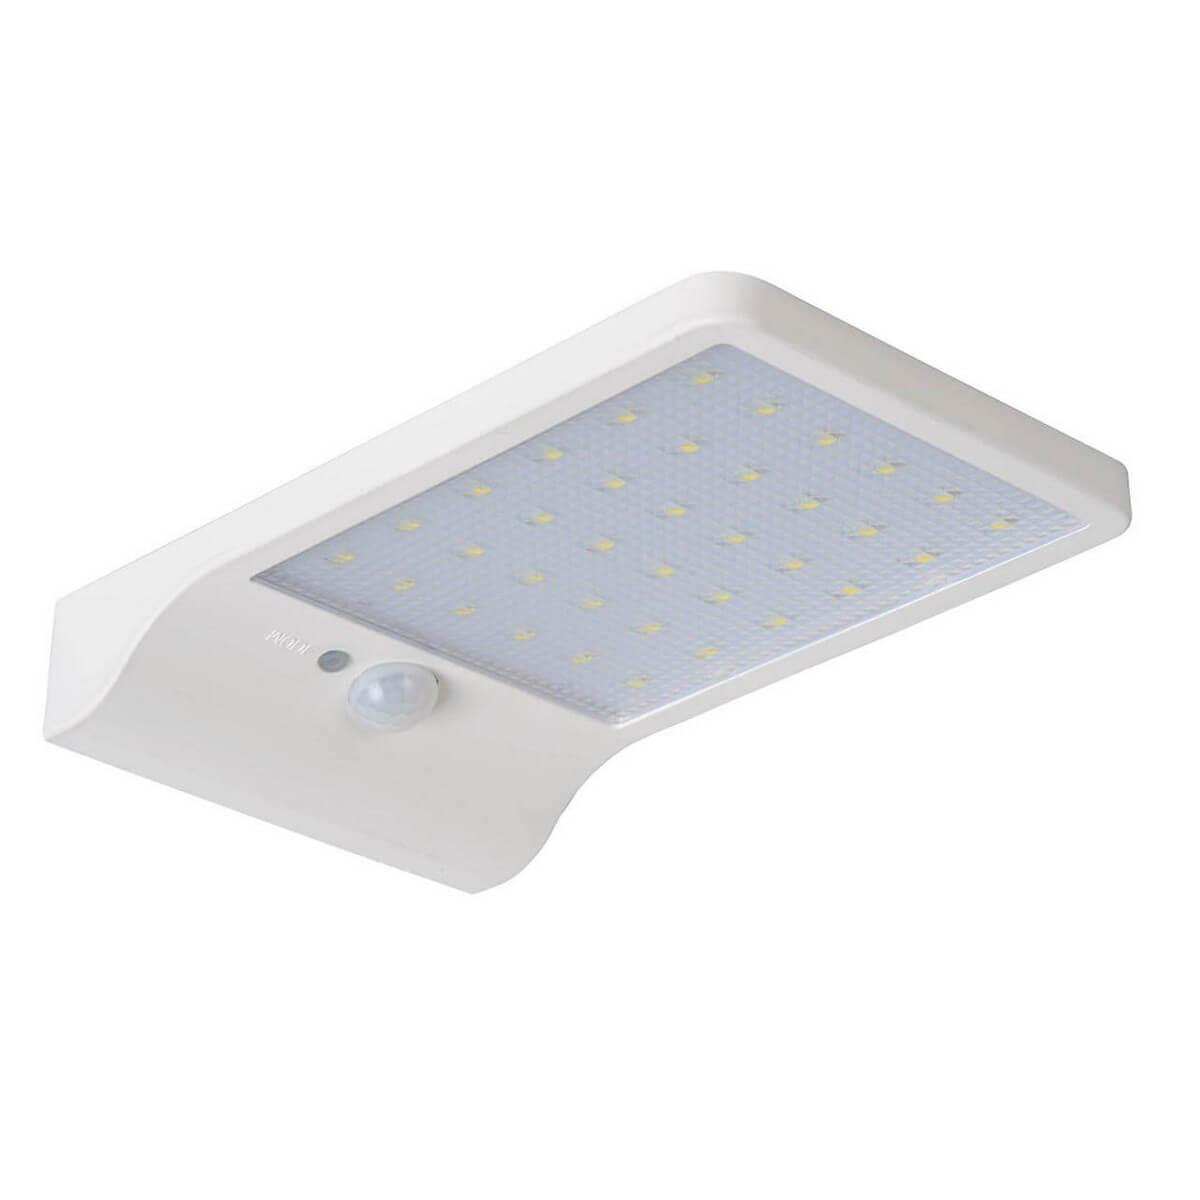 Светильник на солнечных батареях Lucide Basic 22862/04/31